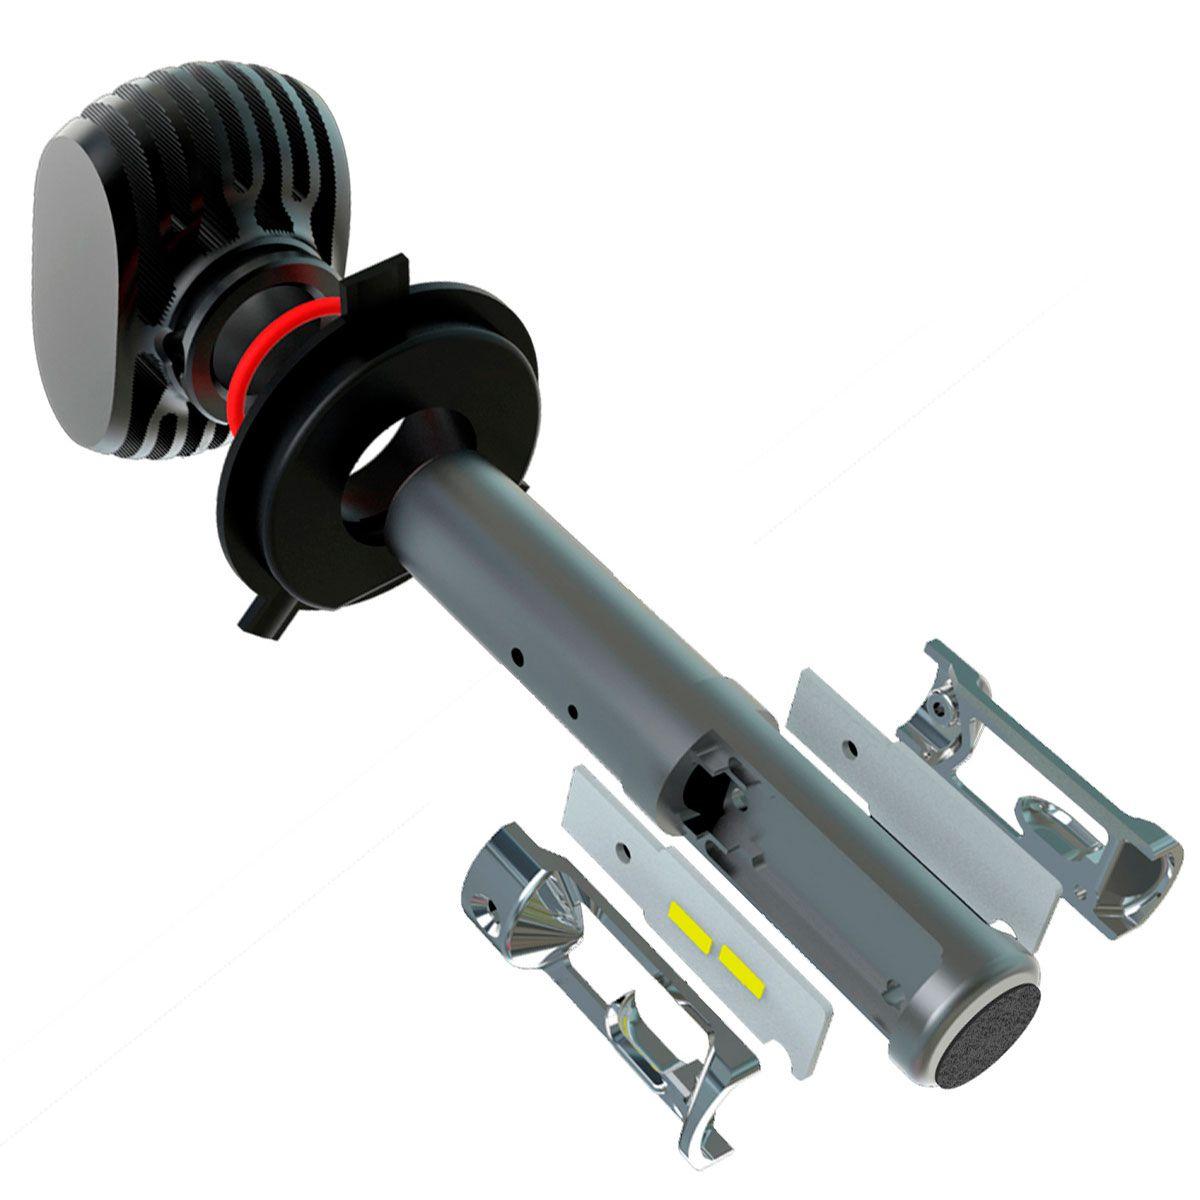 Kit Ultra LED Jetta 2007 2008 2009 2010 2011 2012 2013 2014 tipo xenon farol baixo H7 50W